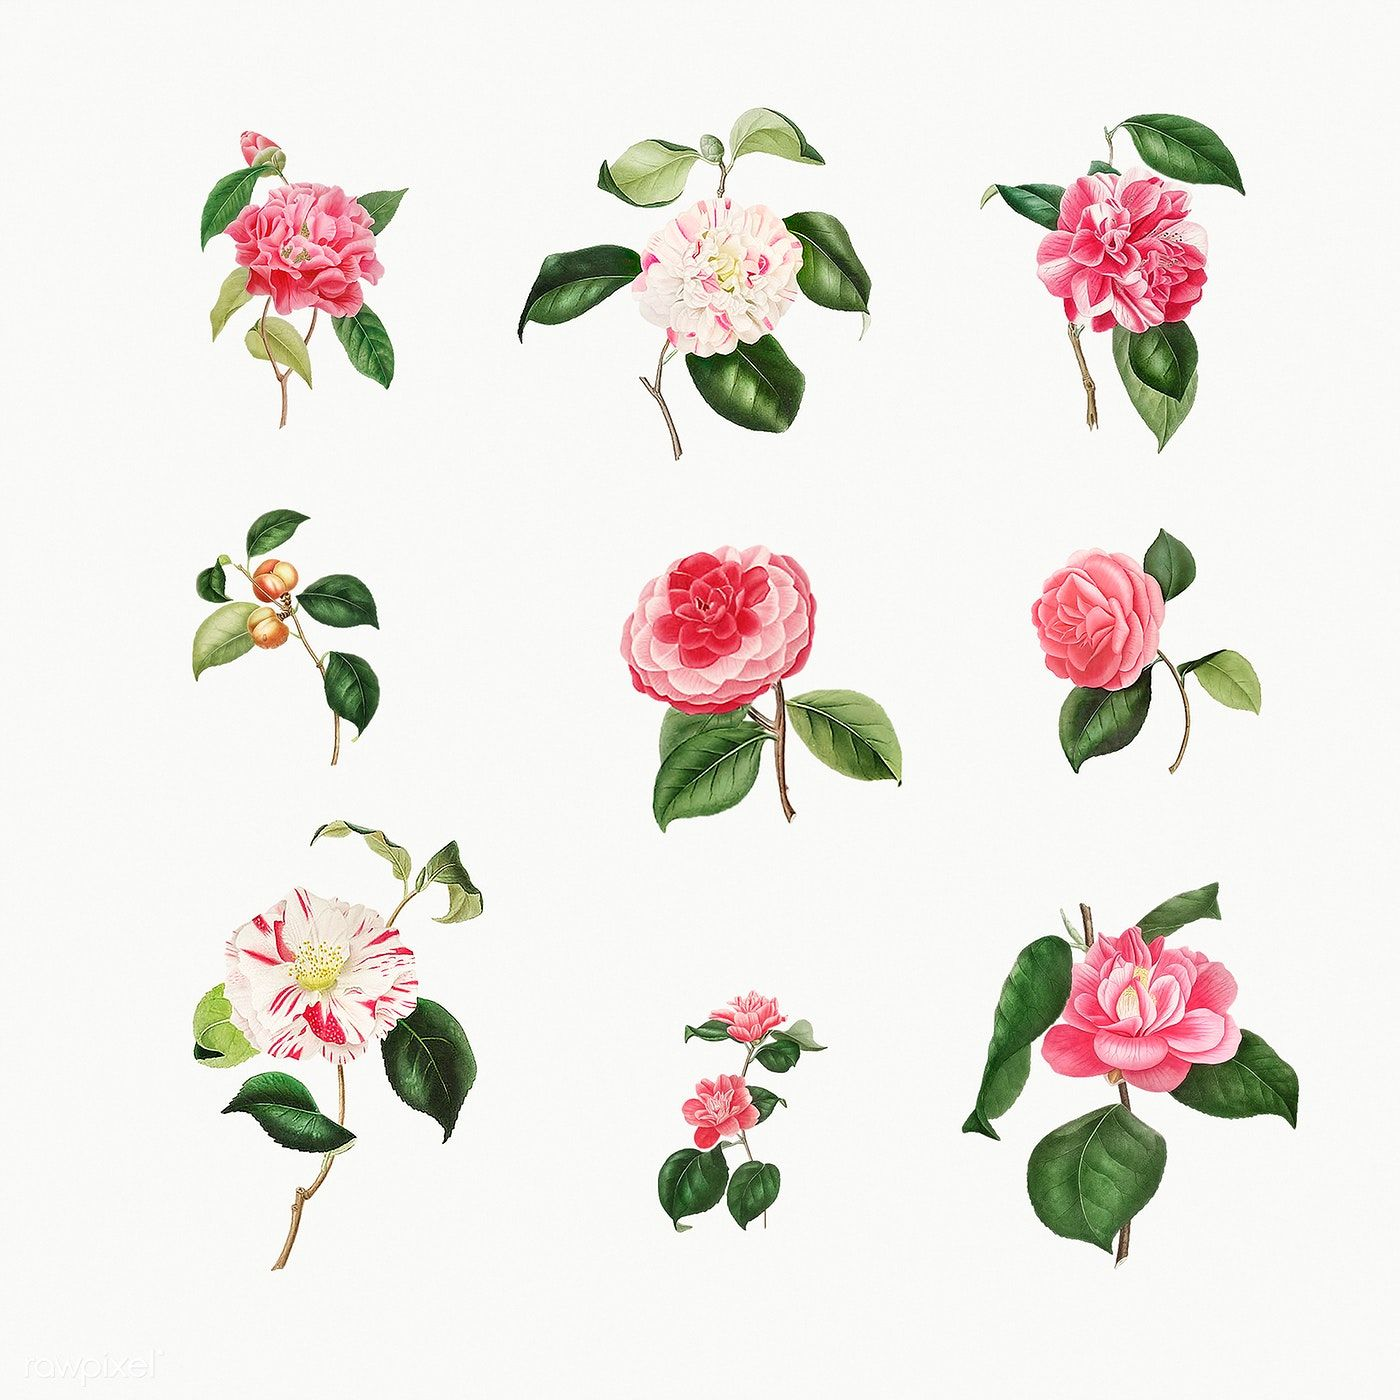 Vintage Set Of Camellia Flowers Illustration Premium Image By Rawpixel Com In 2020 Flower Illustration Rose Illustration Vintage Illustration